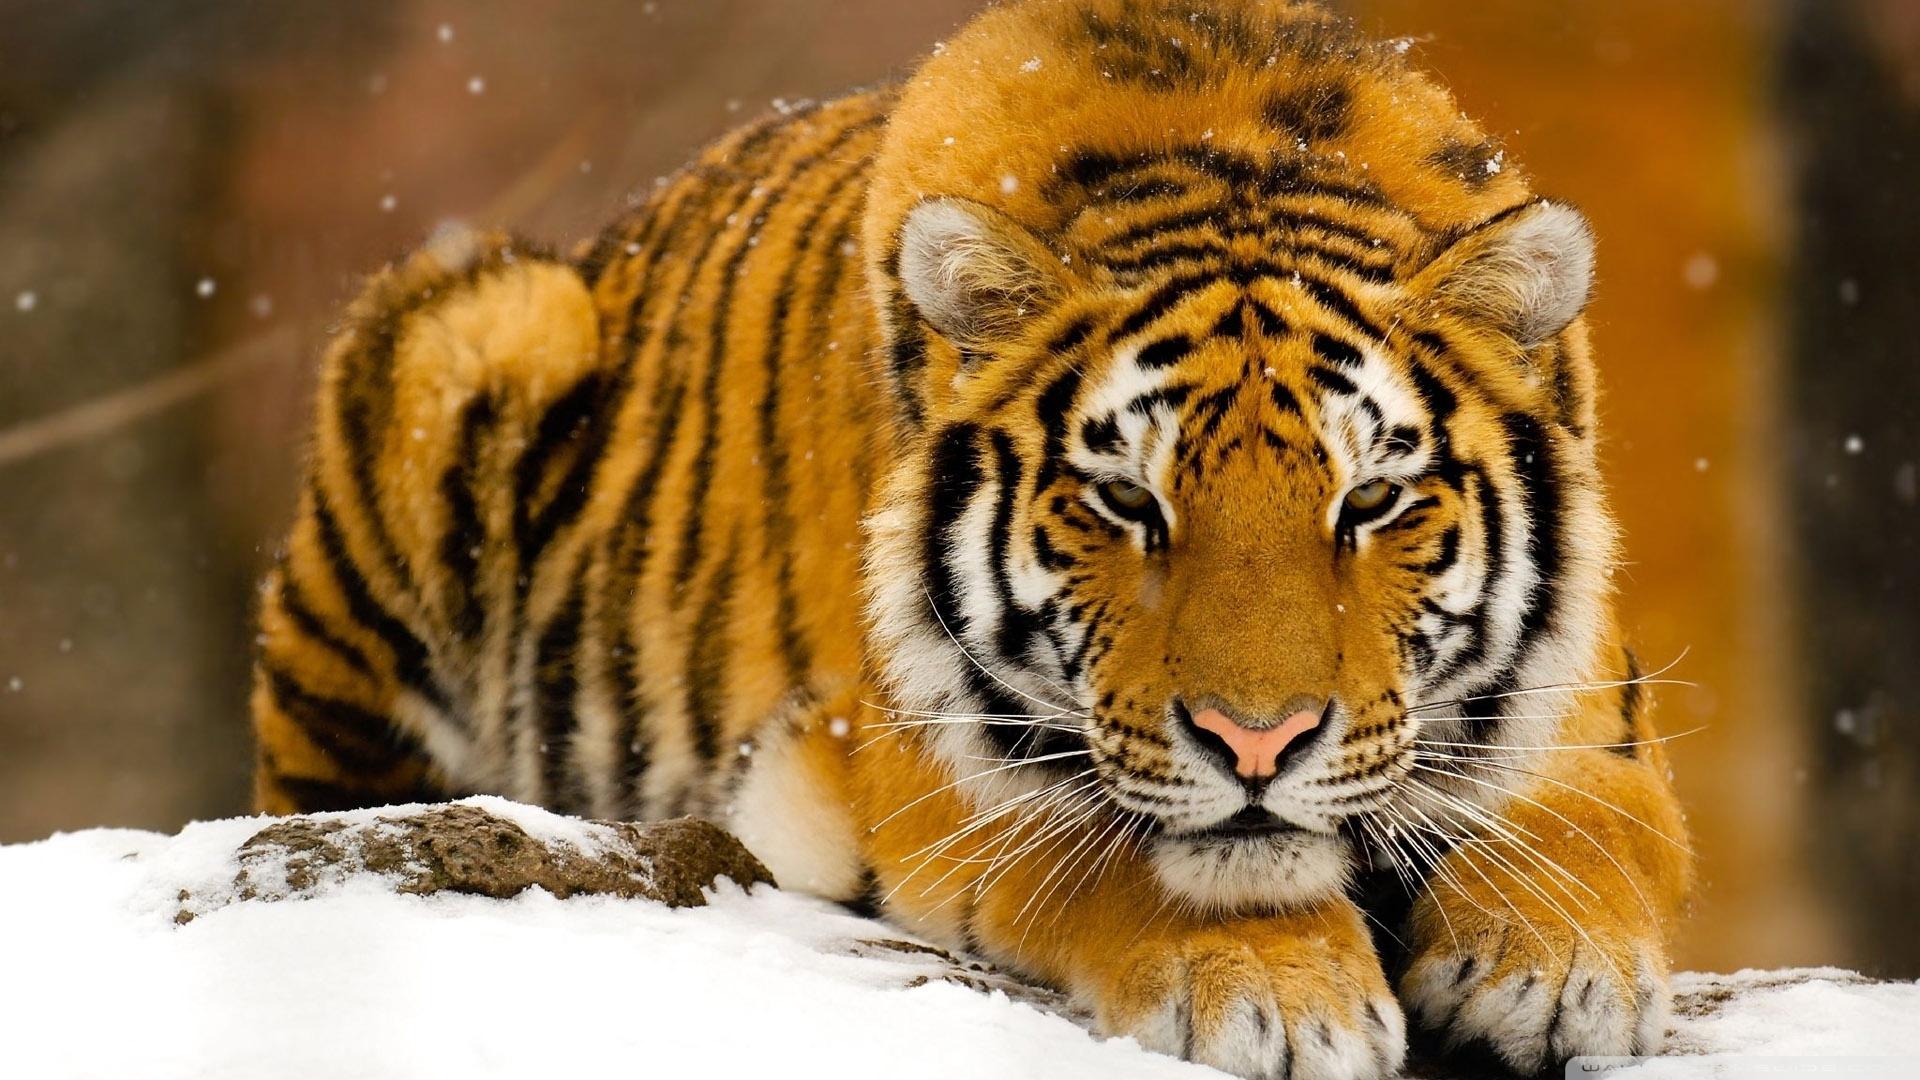 siberian tiger in snow ❤ 4k hd desktop wallpaper for 4k ultra hd tv